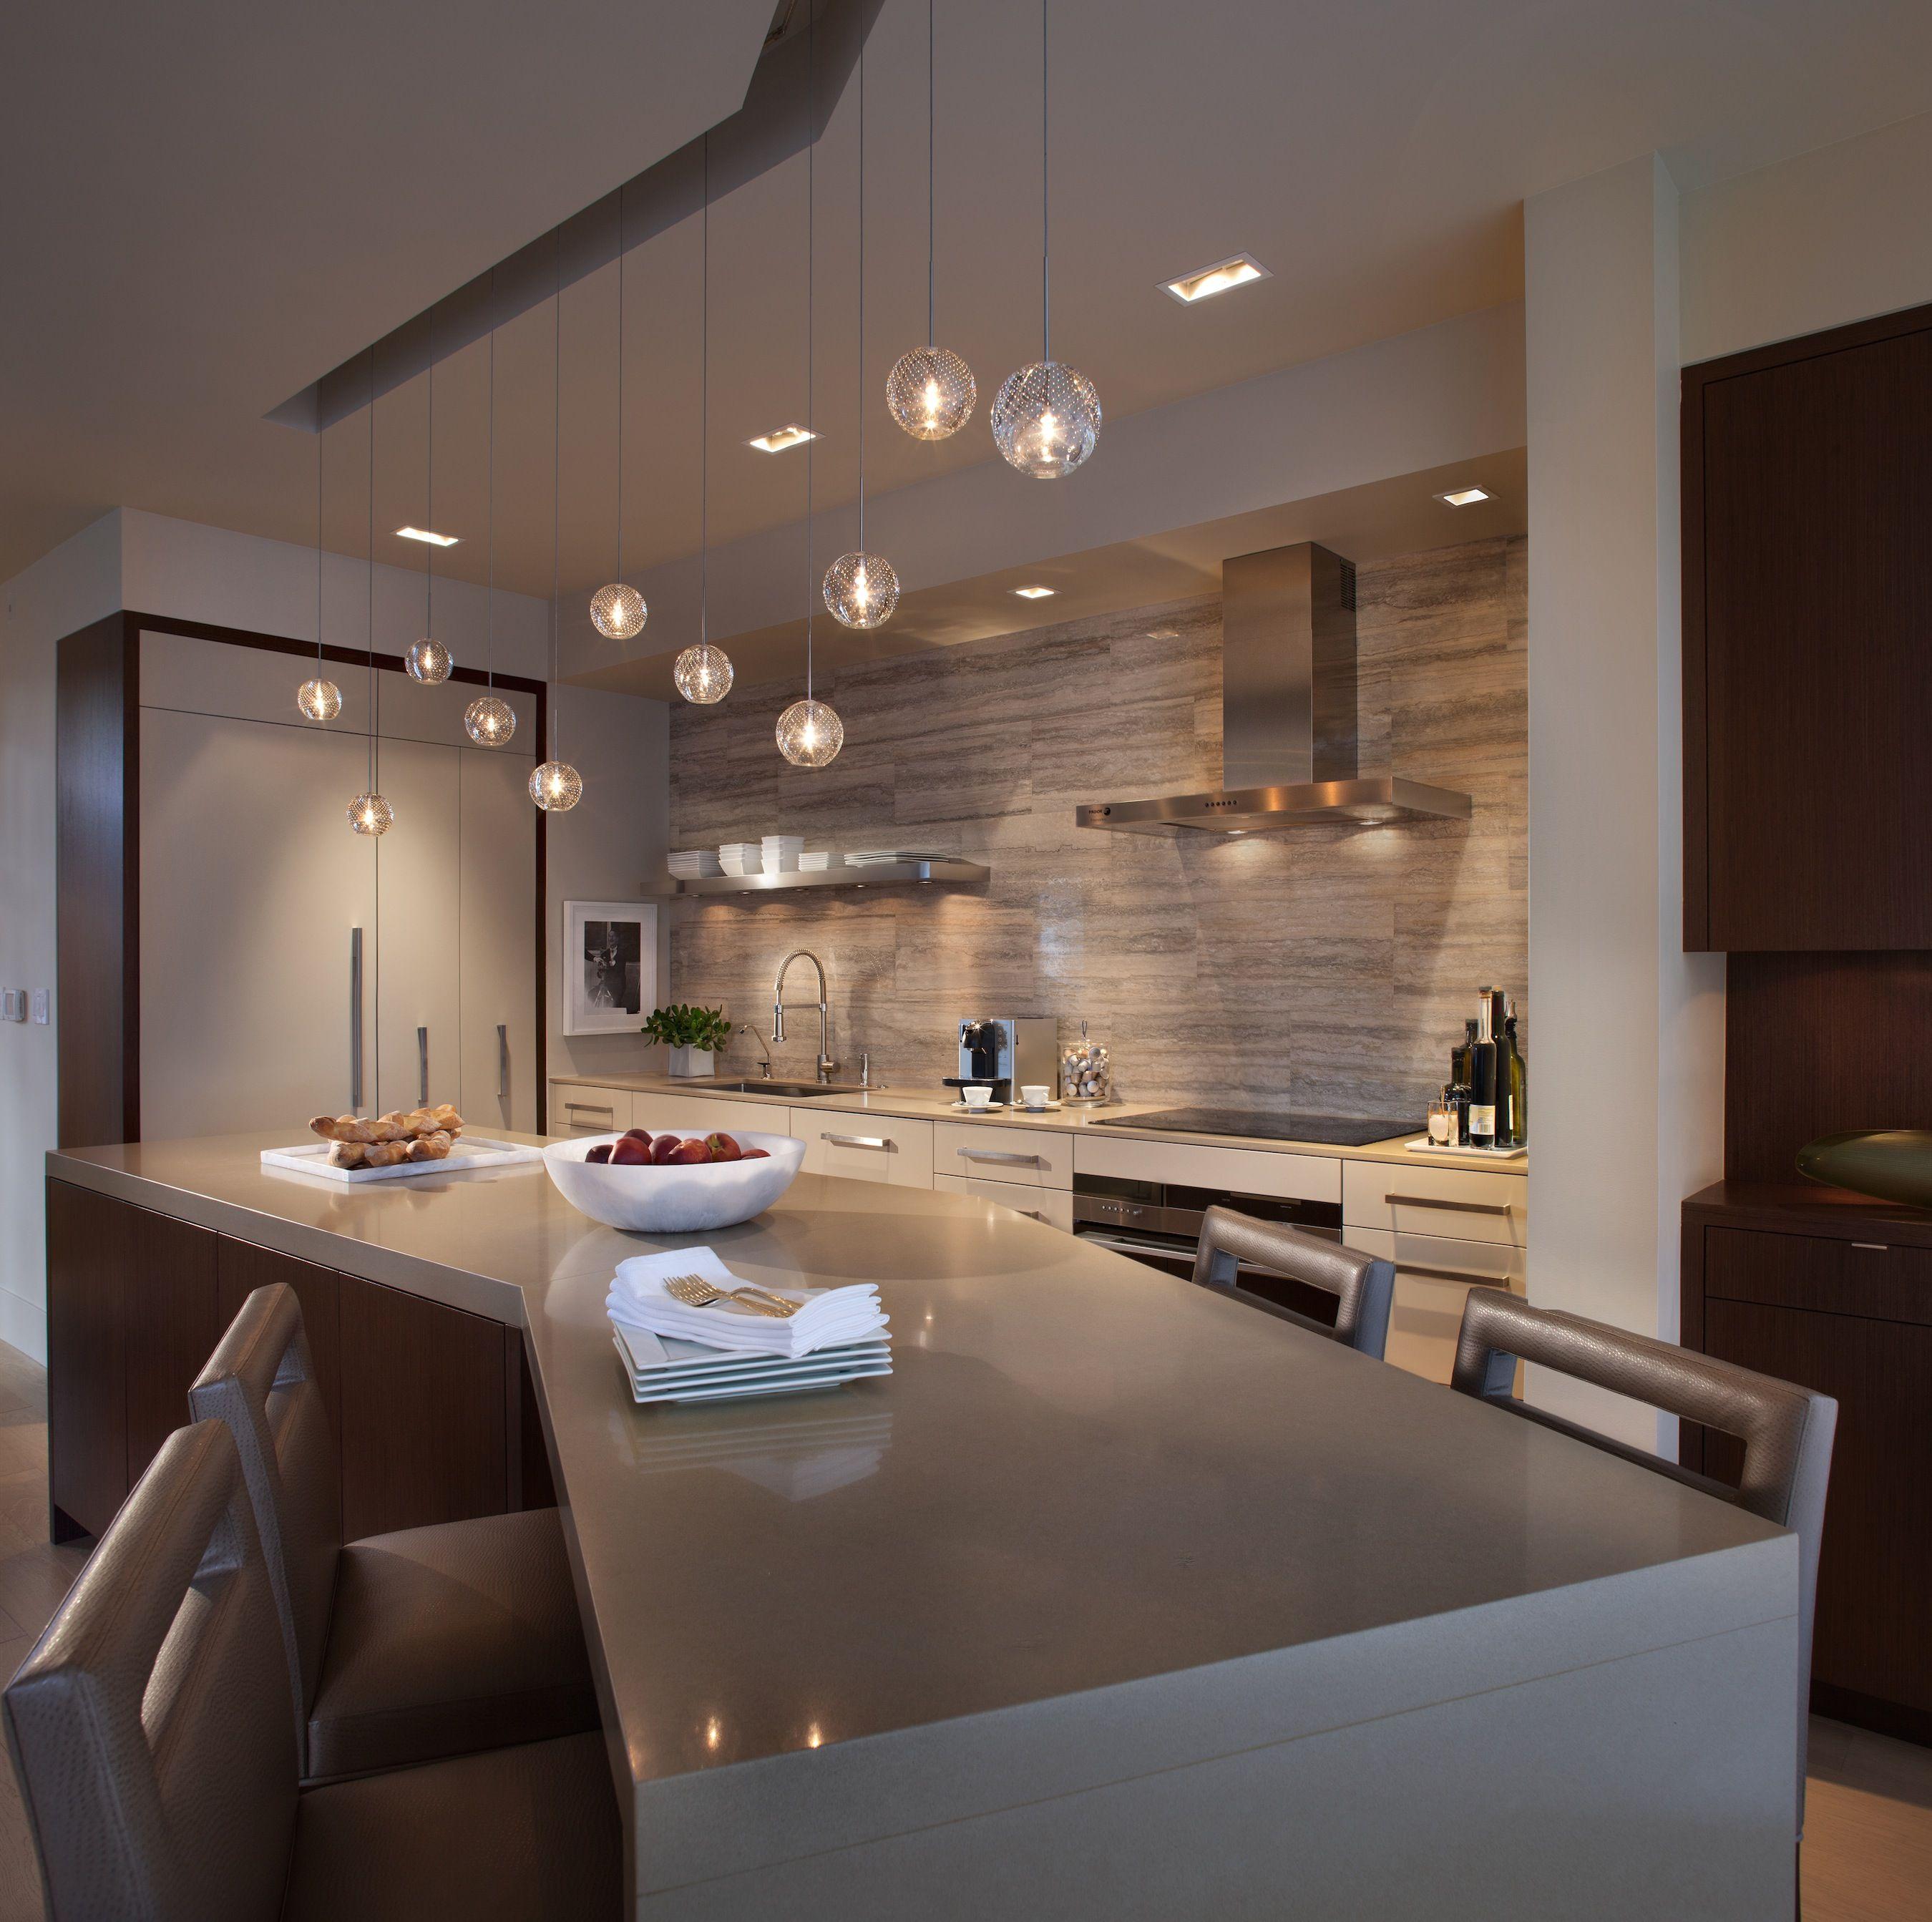 Patricia Gray Interior Design Kitchen Island Hamilton Penthouse